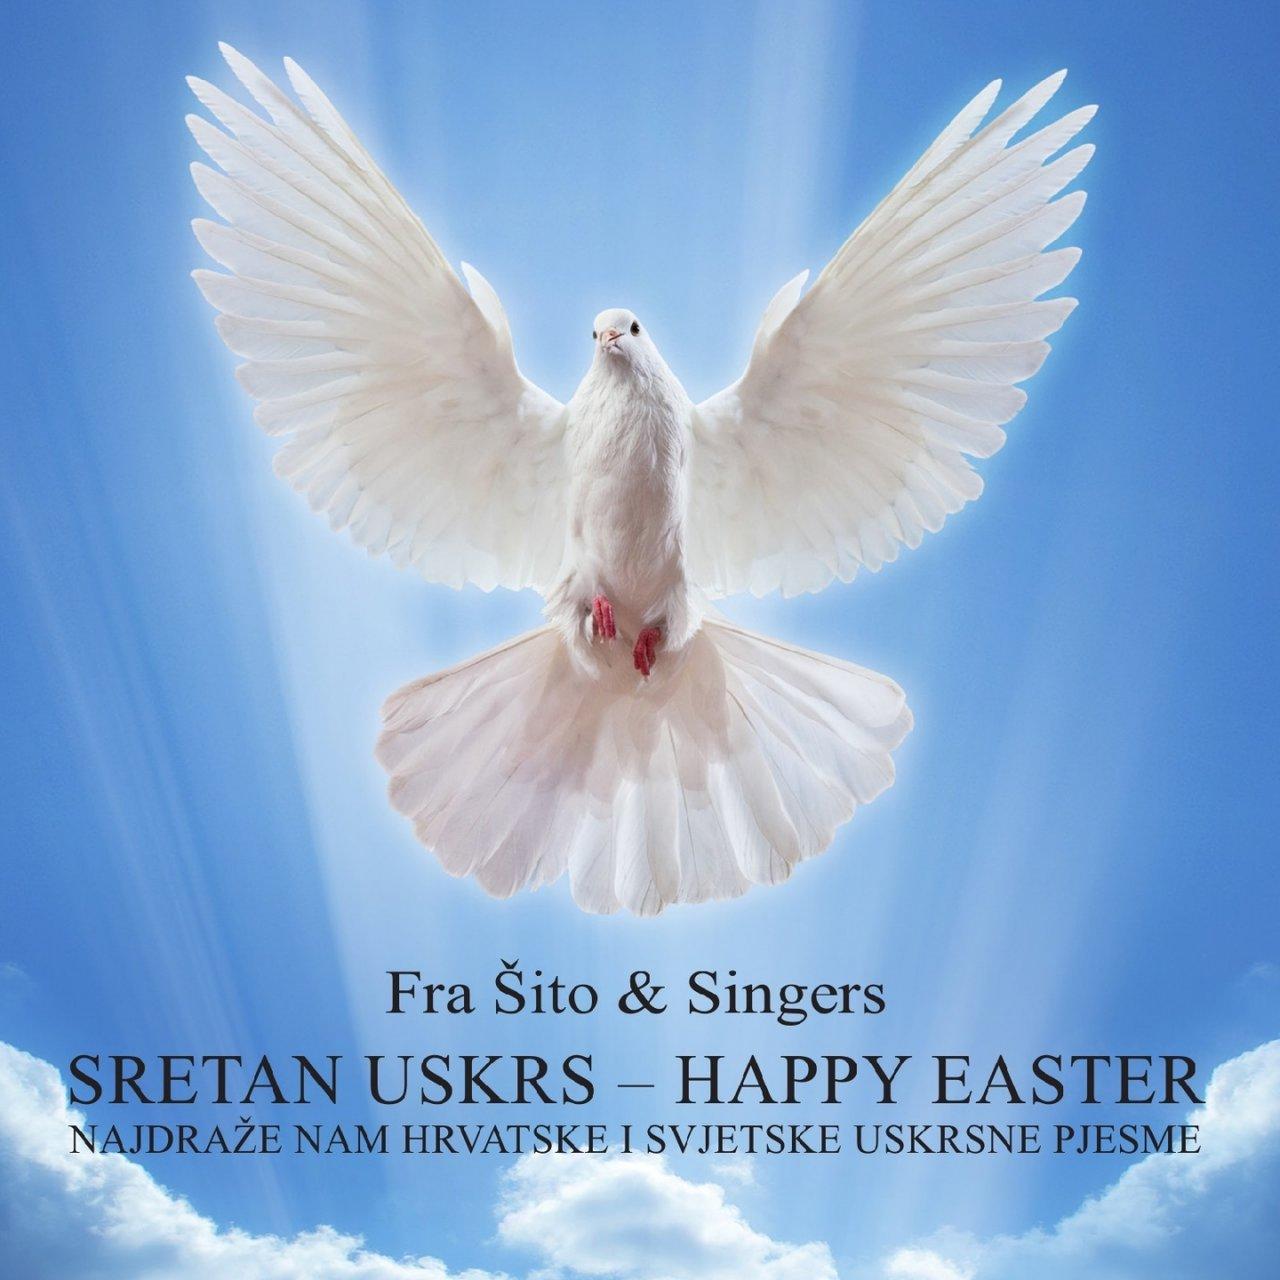 sretan uskrs pjesme Sretan Uskrs   Happy Easter / Razni Izvođači TIDAL sretan uskrs pjesme